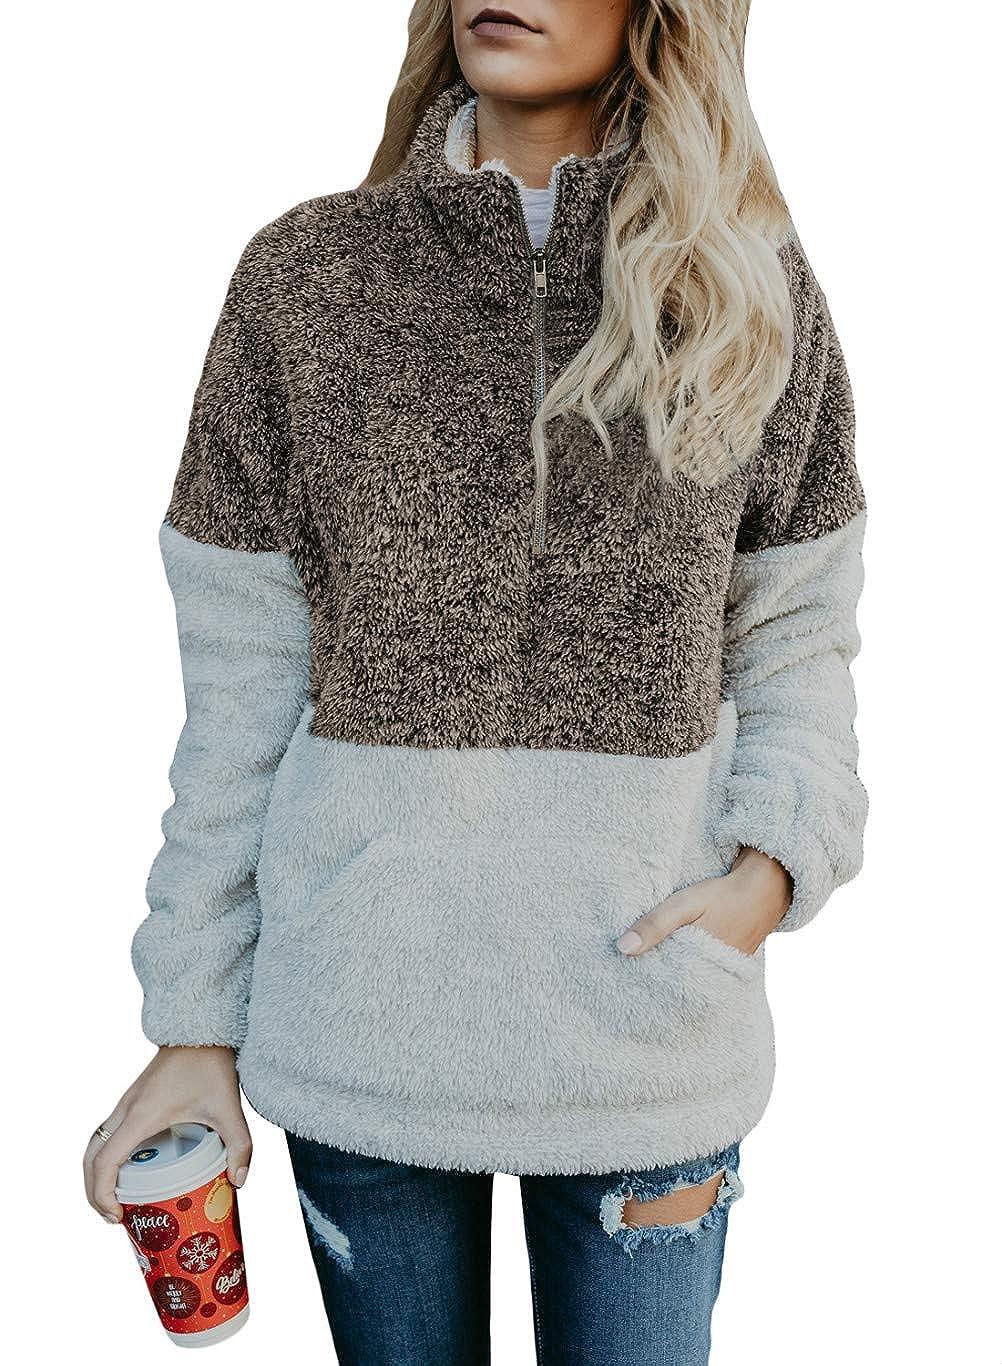 Womens Long Sleeve Zip up Sherpa Pullover Fuzzy Sweater Sweatshirt Hoodies Oversized Fleece Coat Pockets 85145